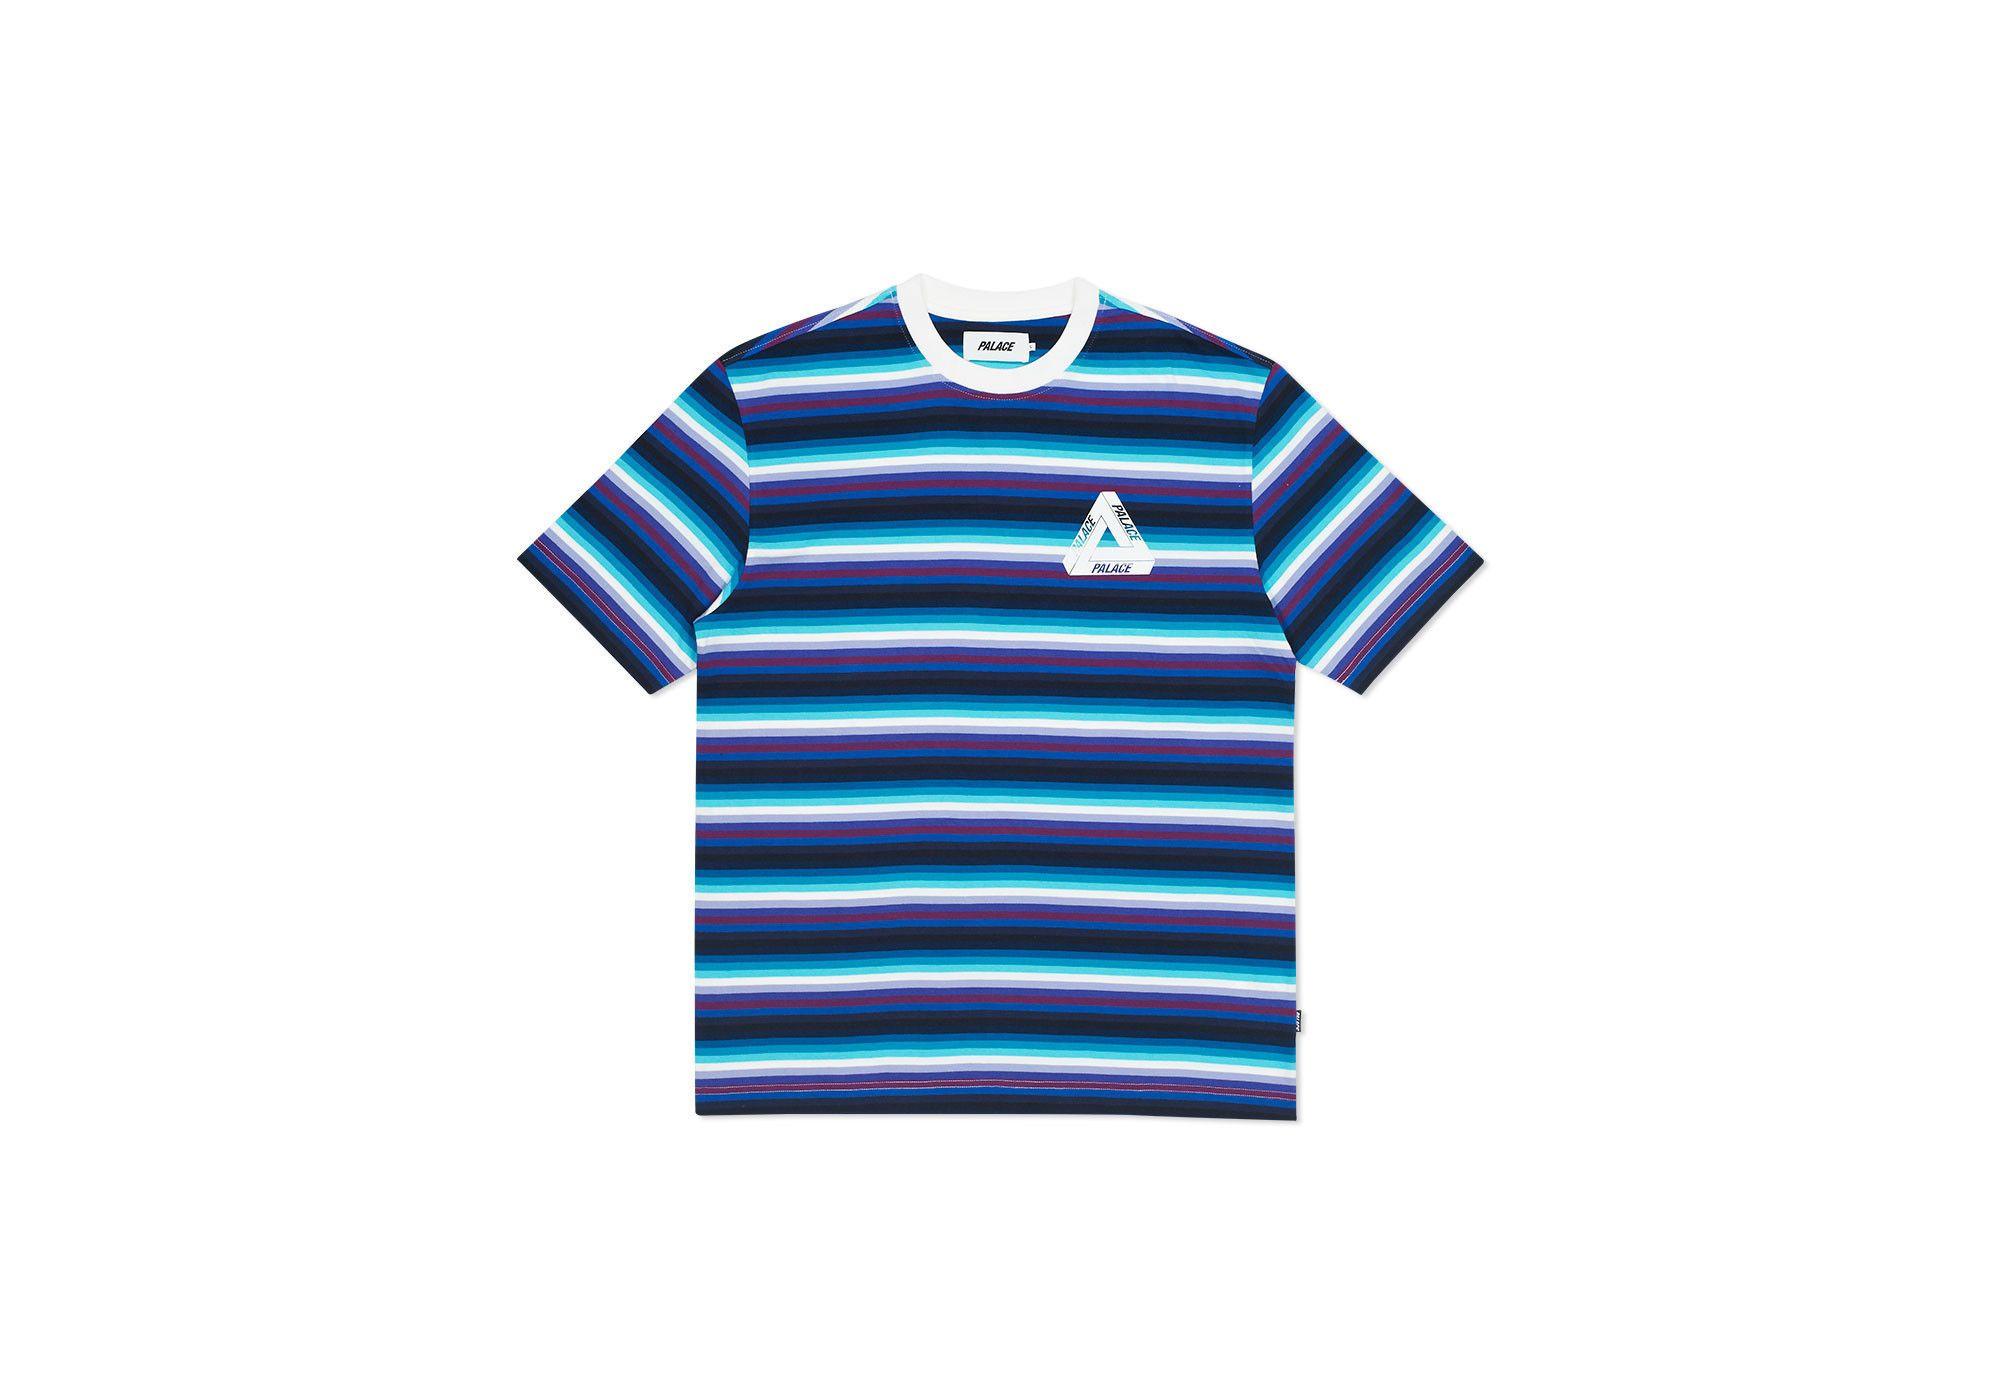 THIN STRIPE T-SHIRT BLUE / PINK | Palace Skateboards